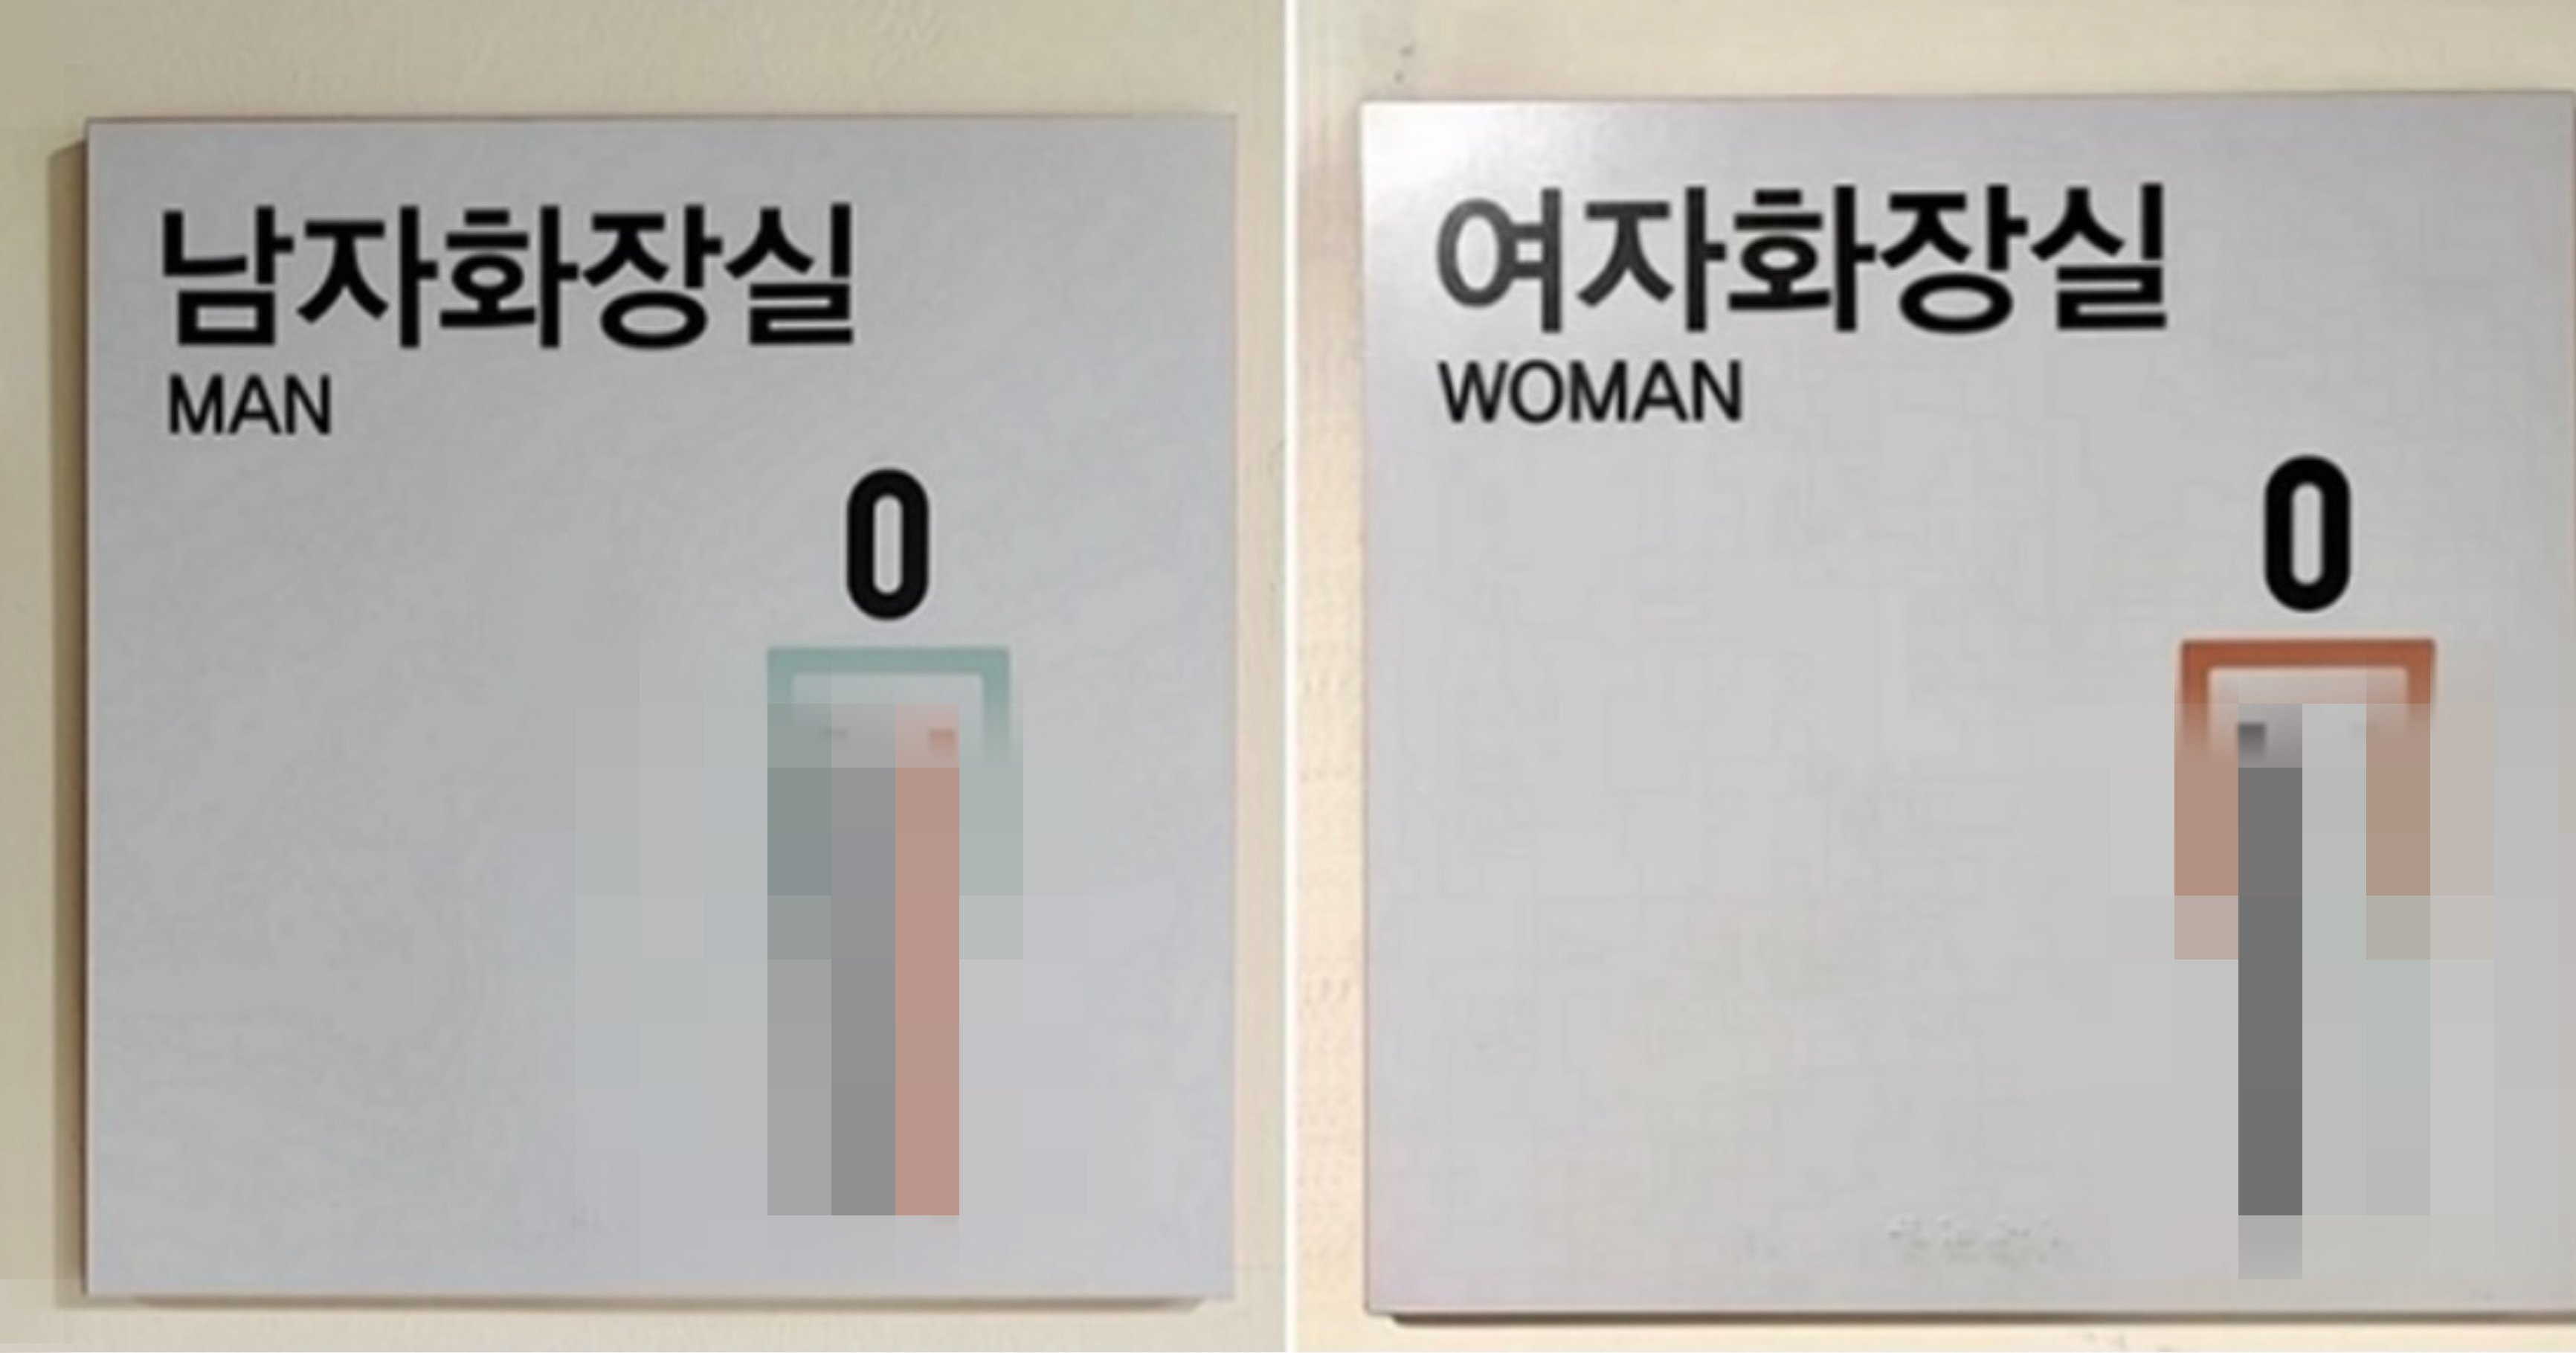 87a2b3da 6e62 40a7 921e 528377ebb4de.jpeg?resize=412,232 - 서울시 '모두의 학교'에서 성 고정관념을 타파하기 위해 실제 사용하고 있는 남녀 화장실 '팻말'